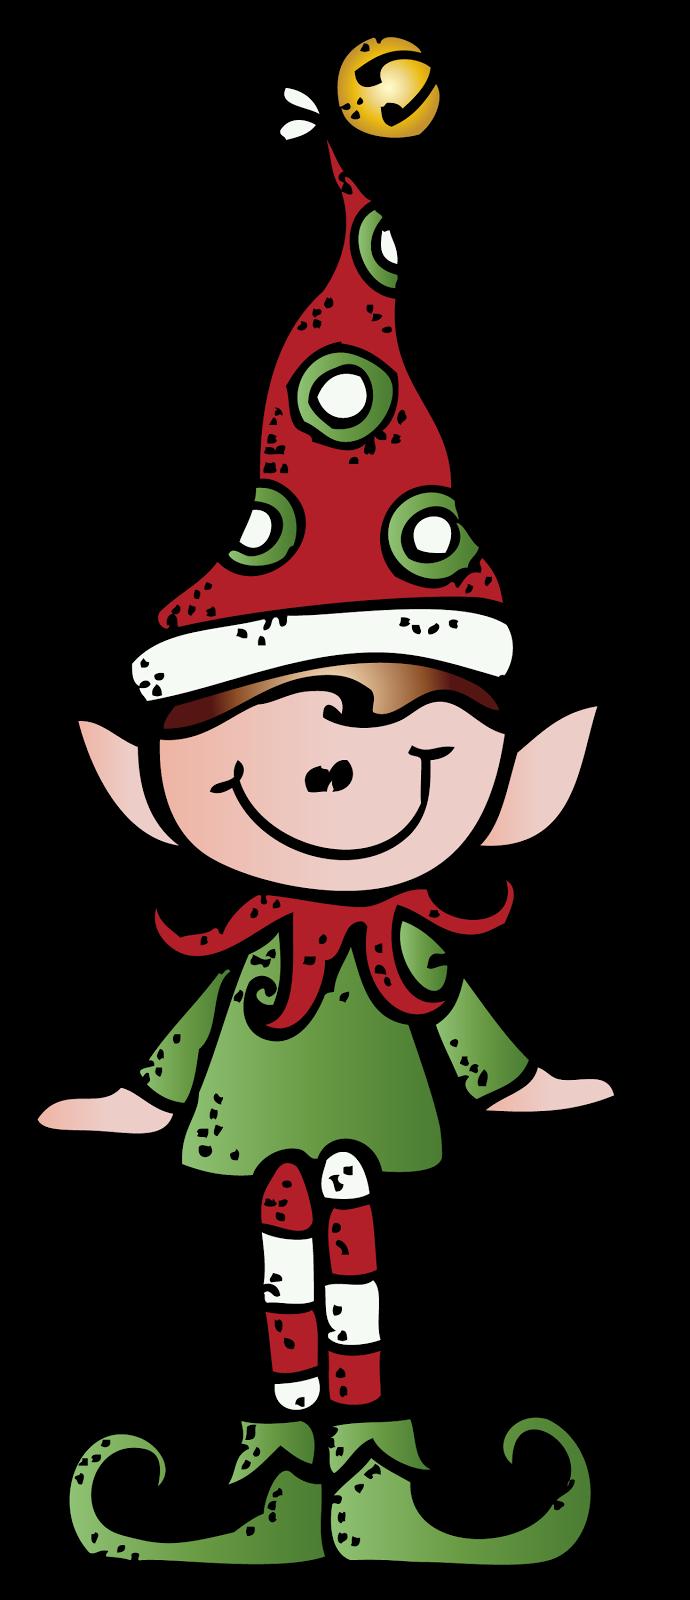 Elf pictures qygjxz x. Husky clipart christmas